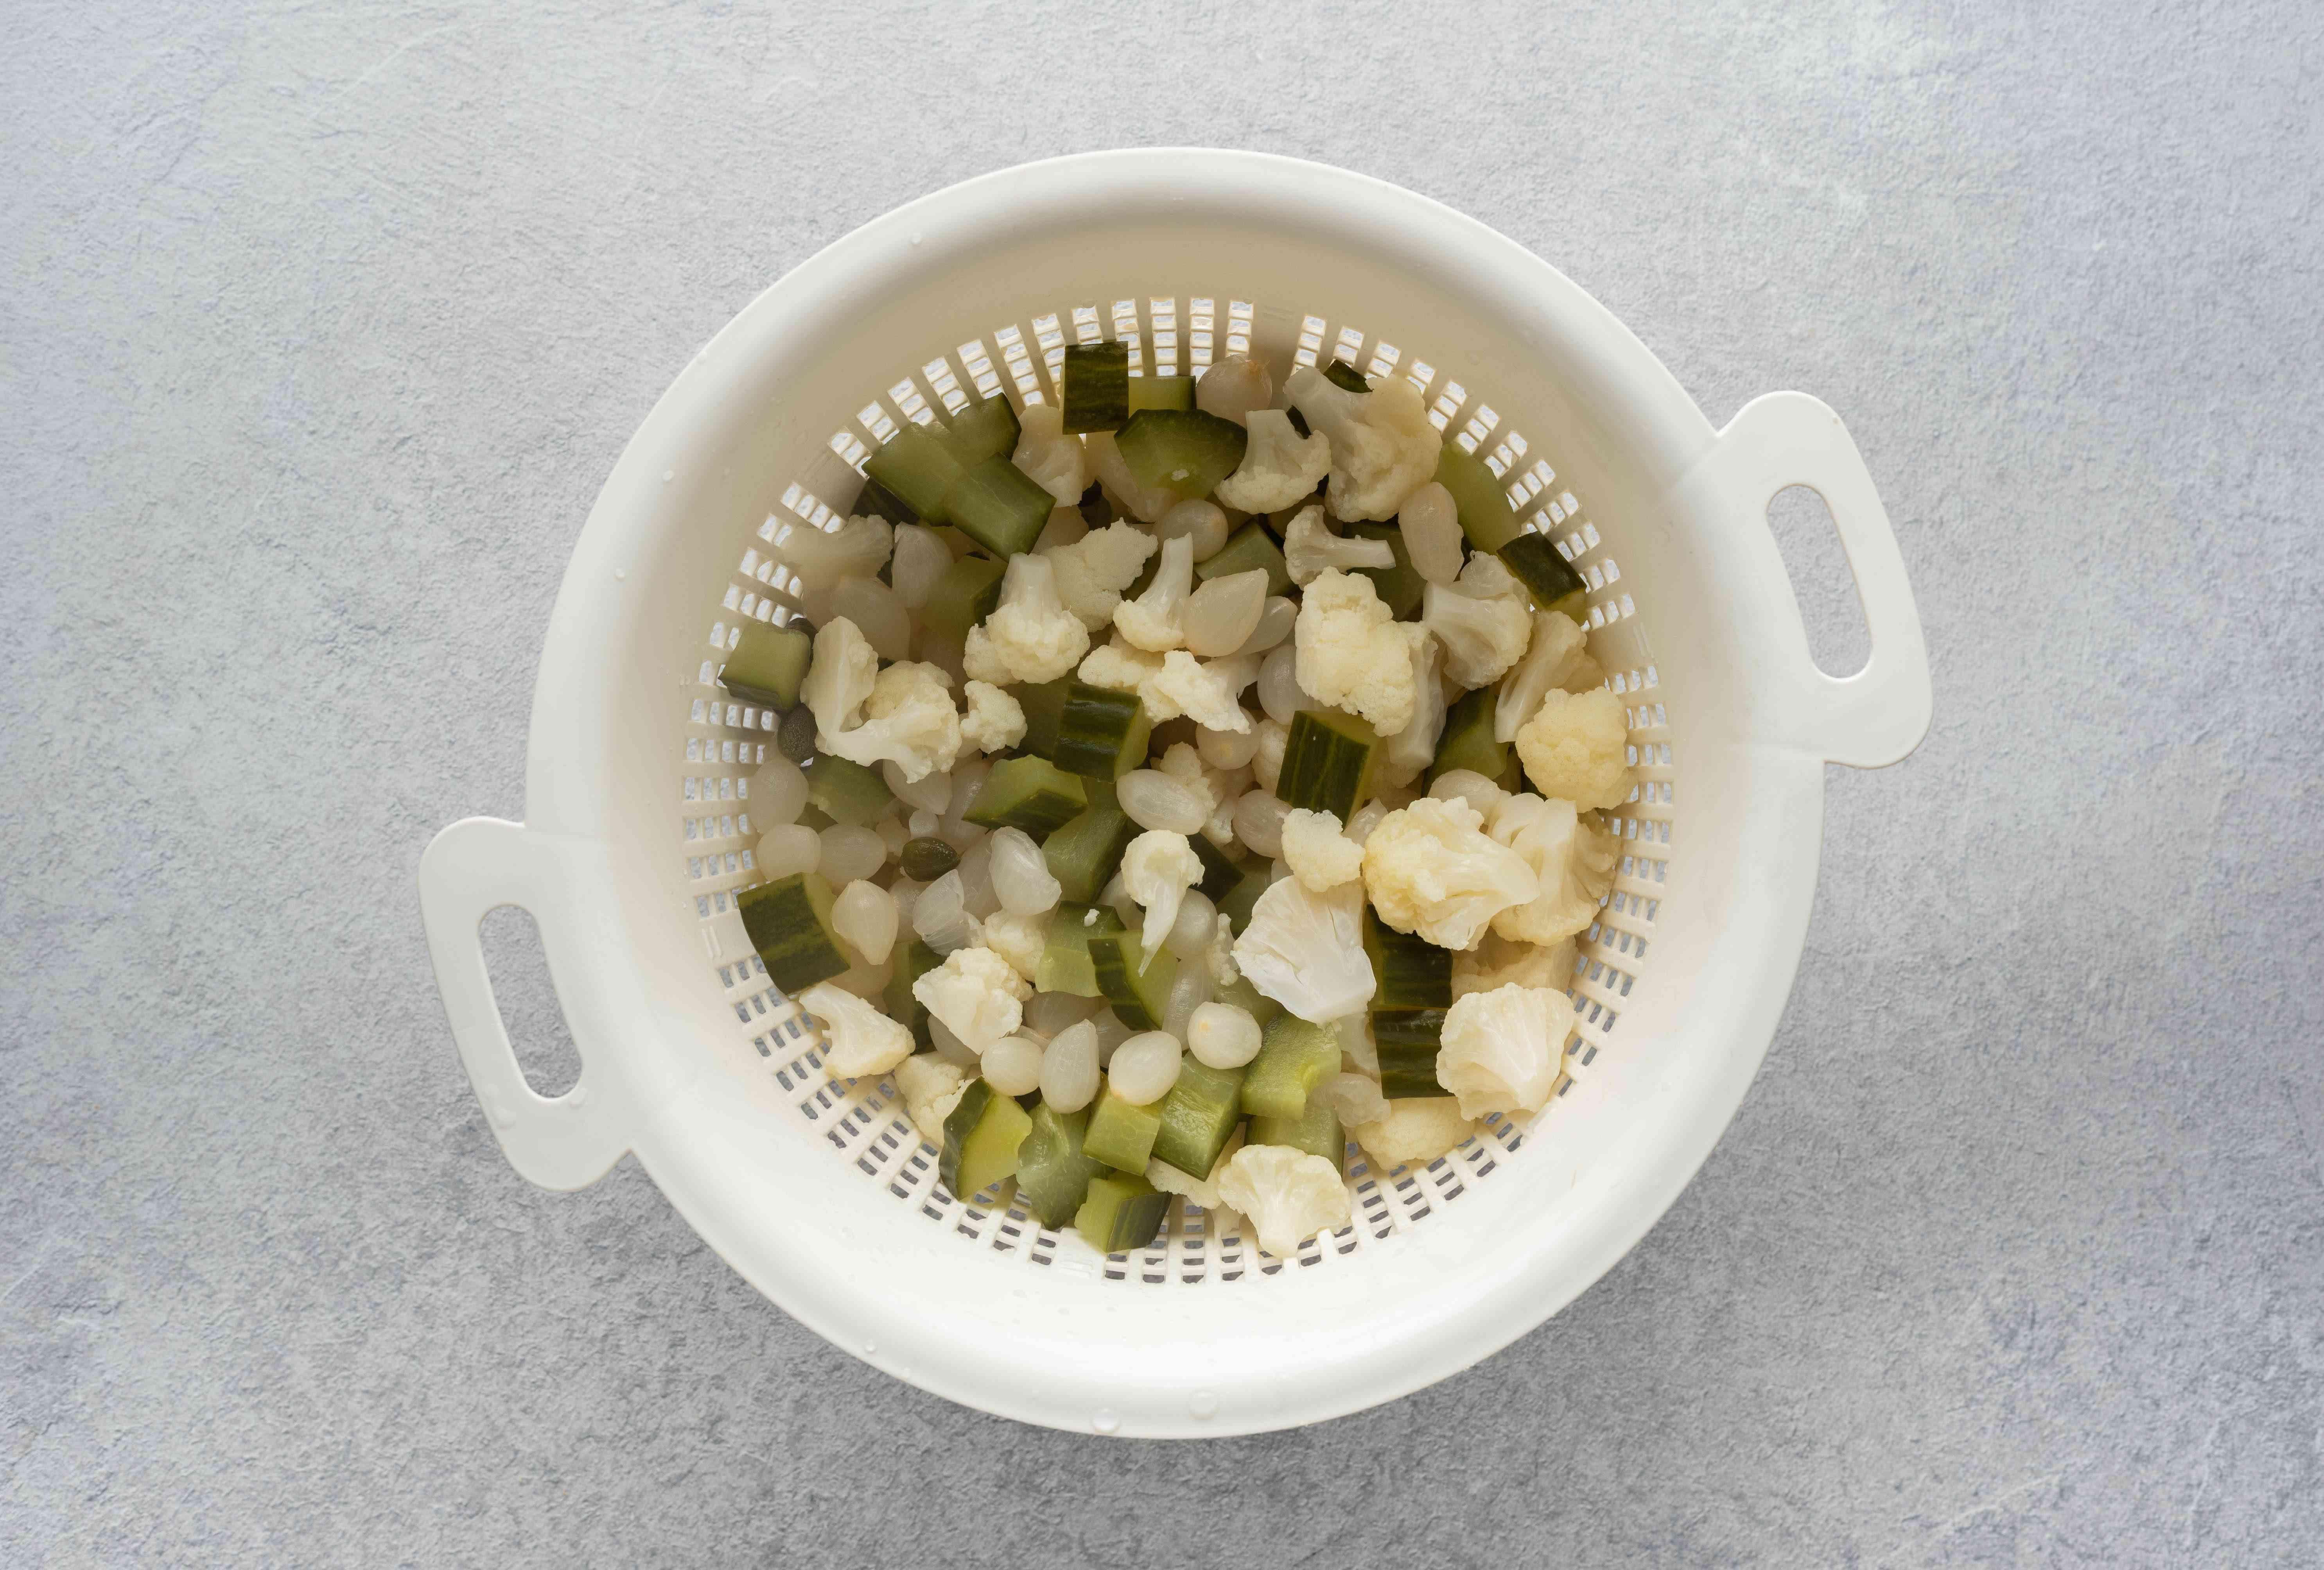 Cooked vegetables in a colander